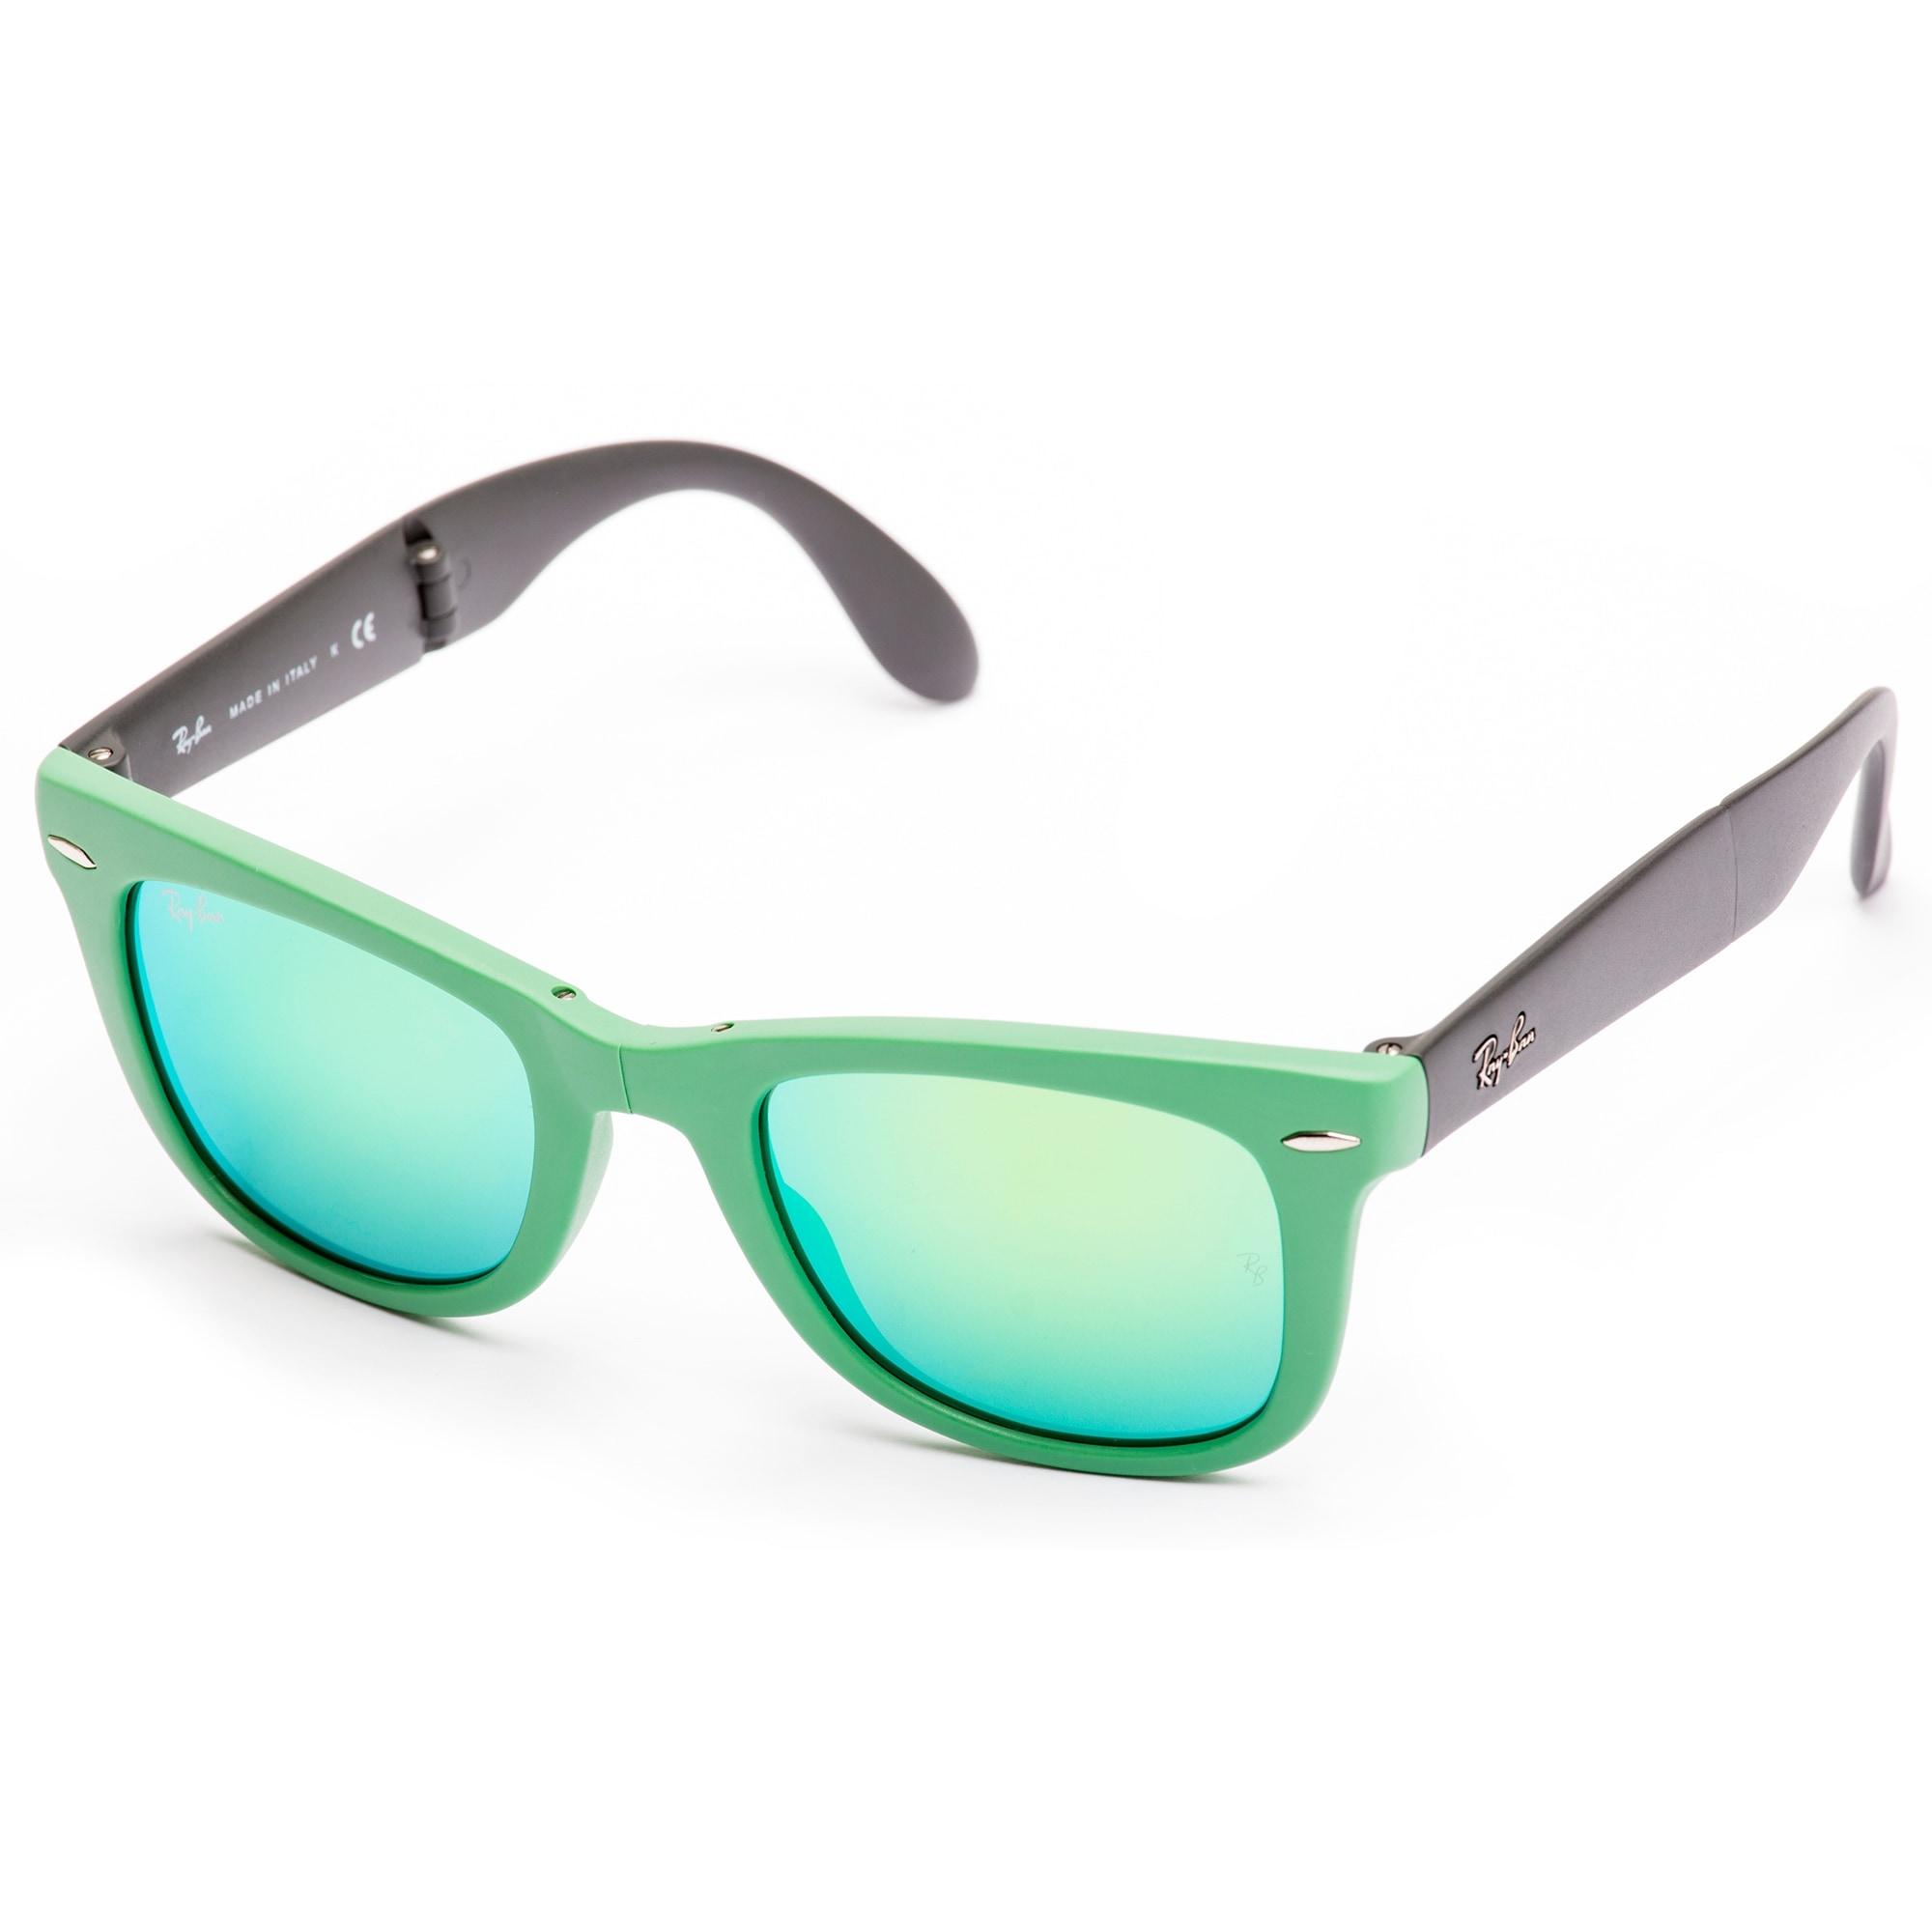 e6425d4bfd474 ... ebay shop ray ban folding wayfarer sunglasses green green flash free  shipping today overstock 19458380 cd923